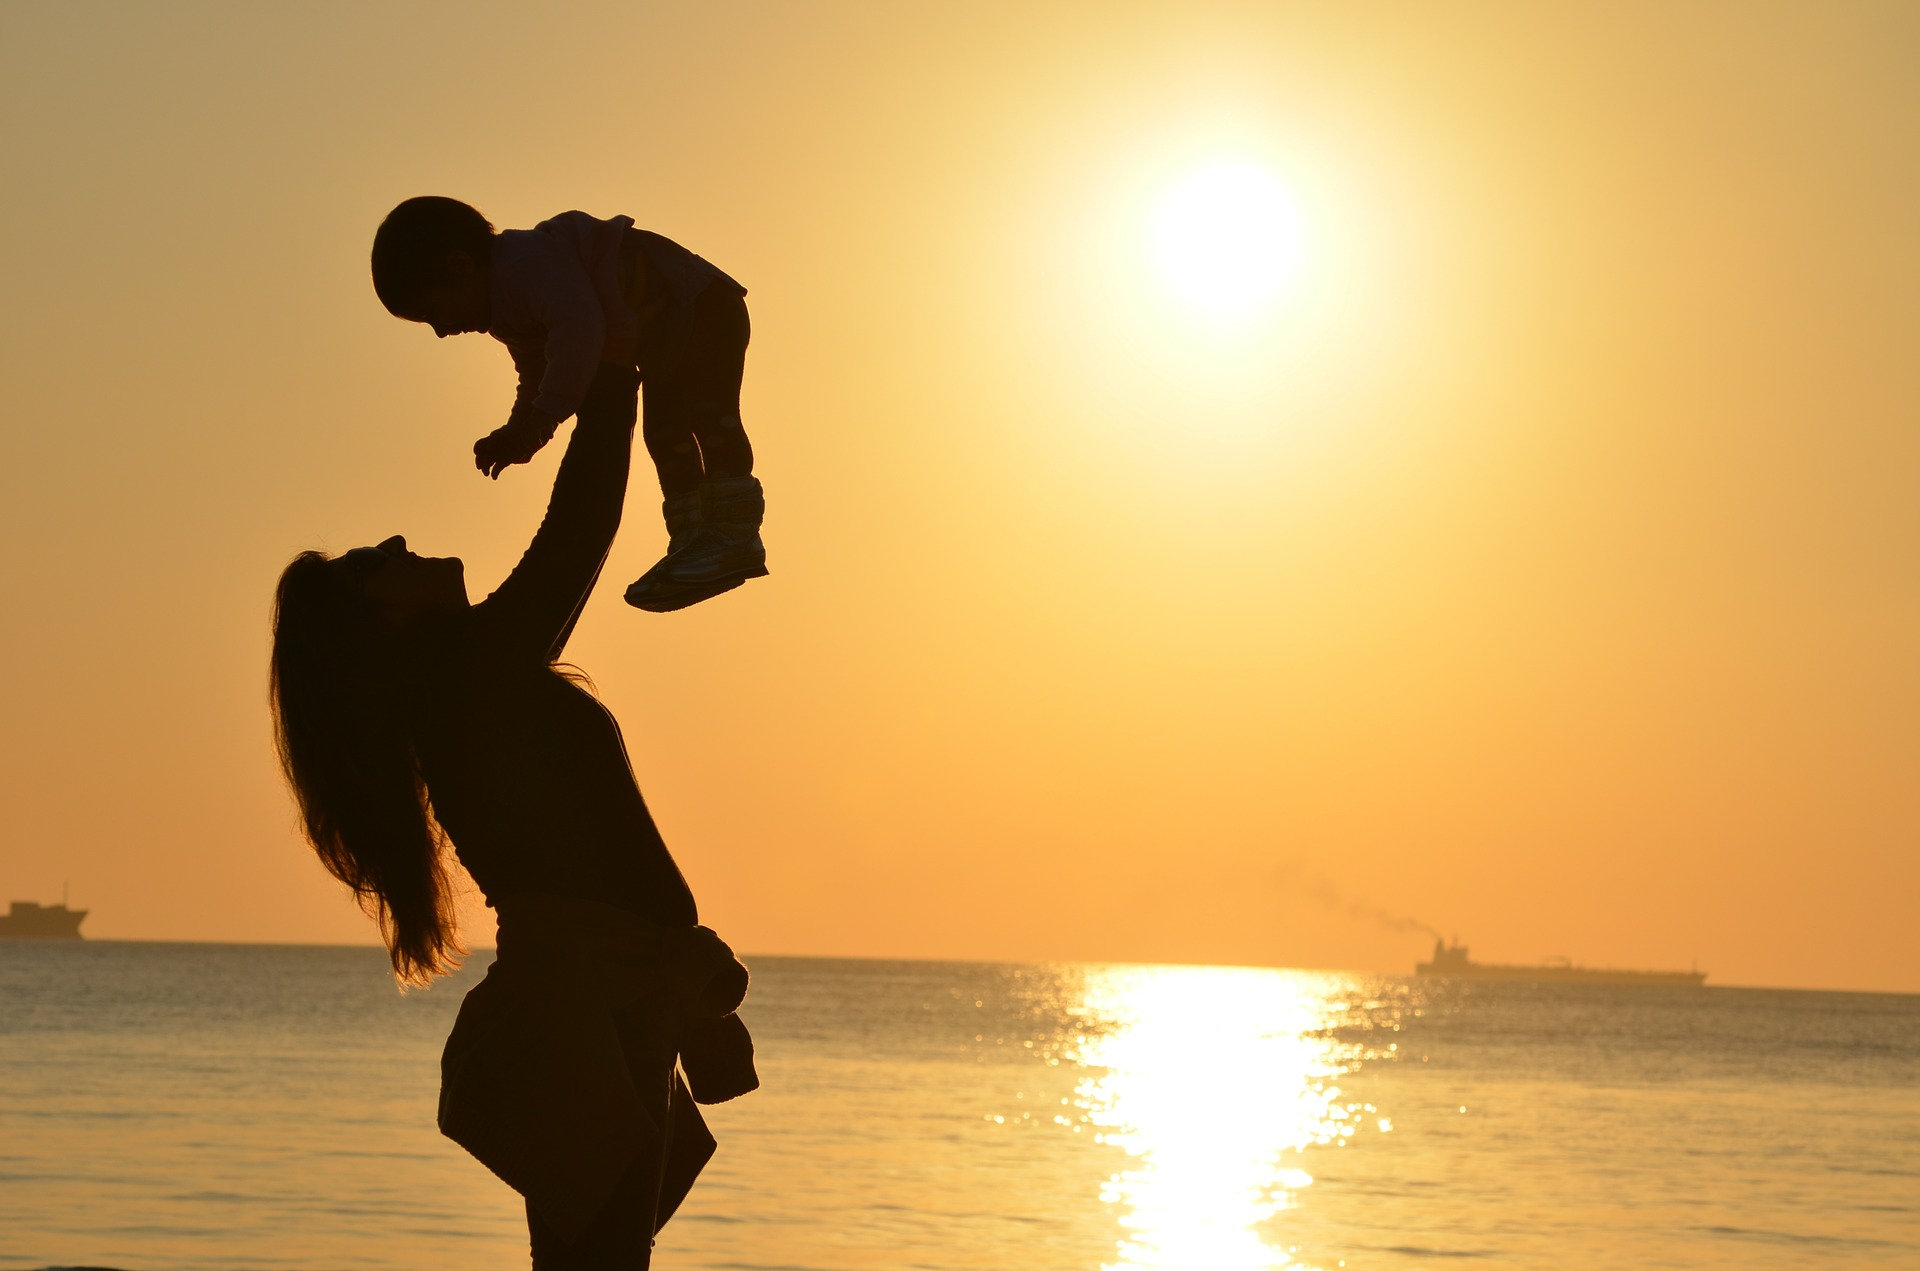 intrebari despre mama - sfatulparintilor.ro - pixabay_com